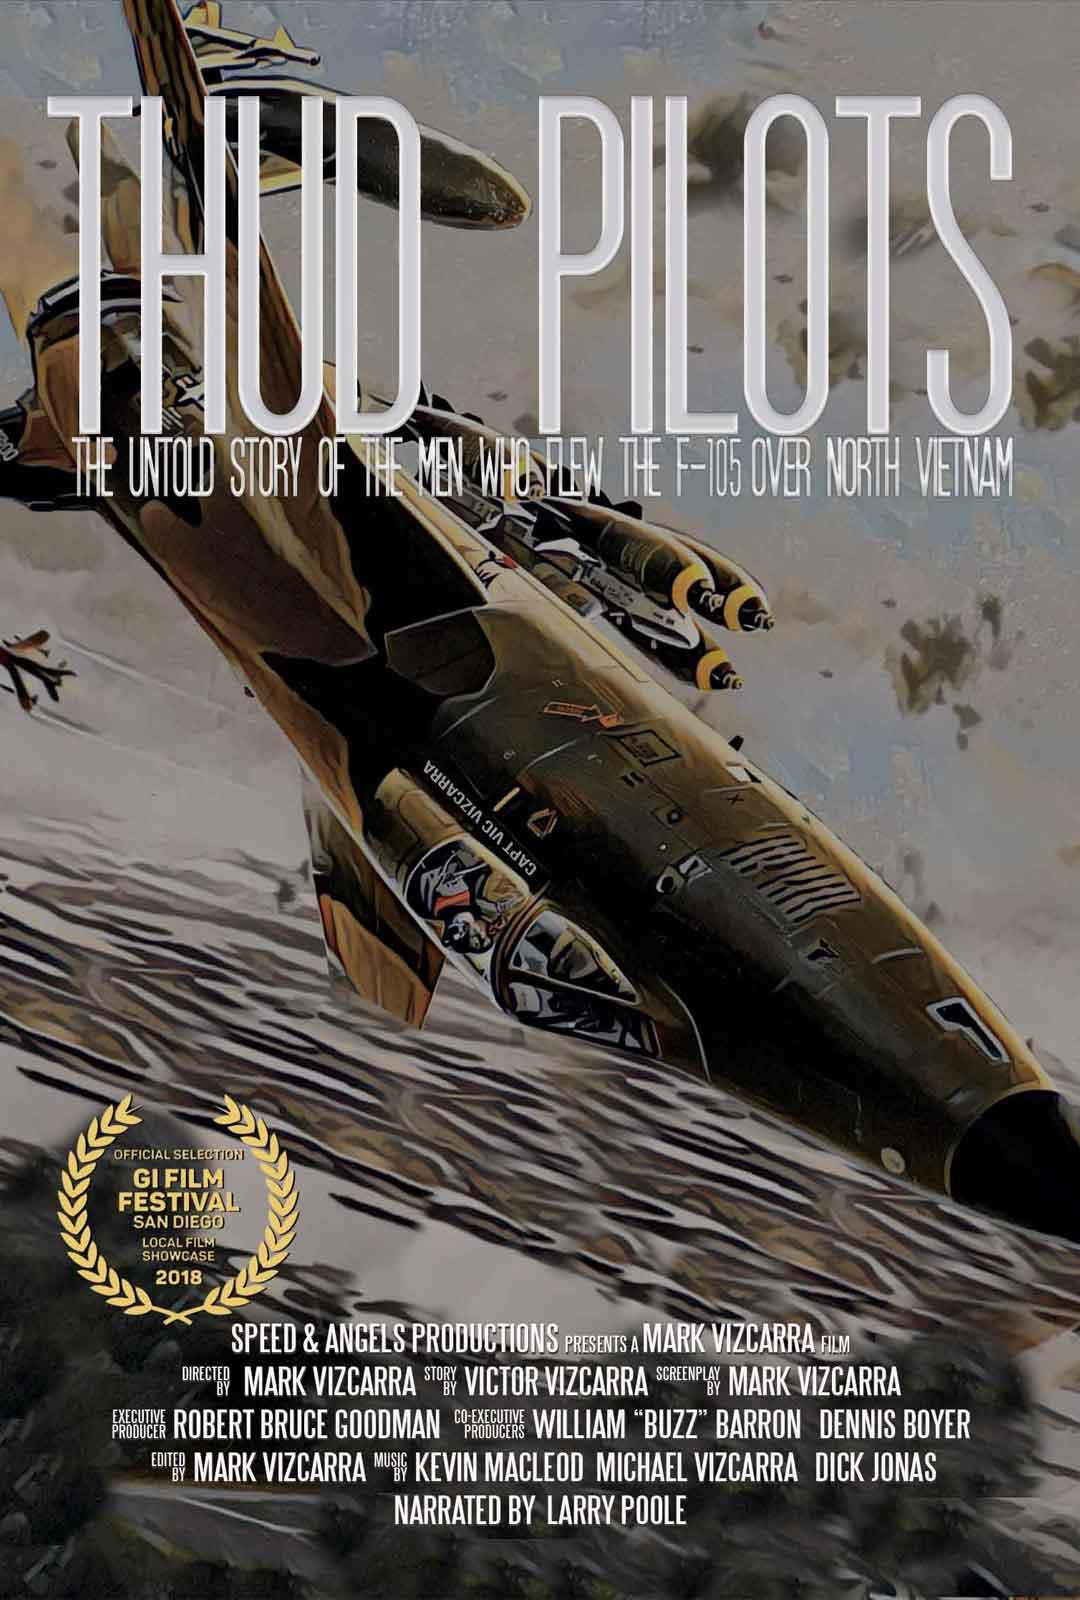 Thud Pilots (2018) WEBRip 1080p